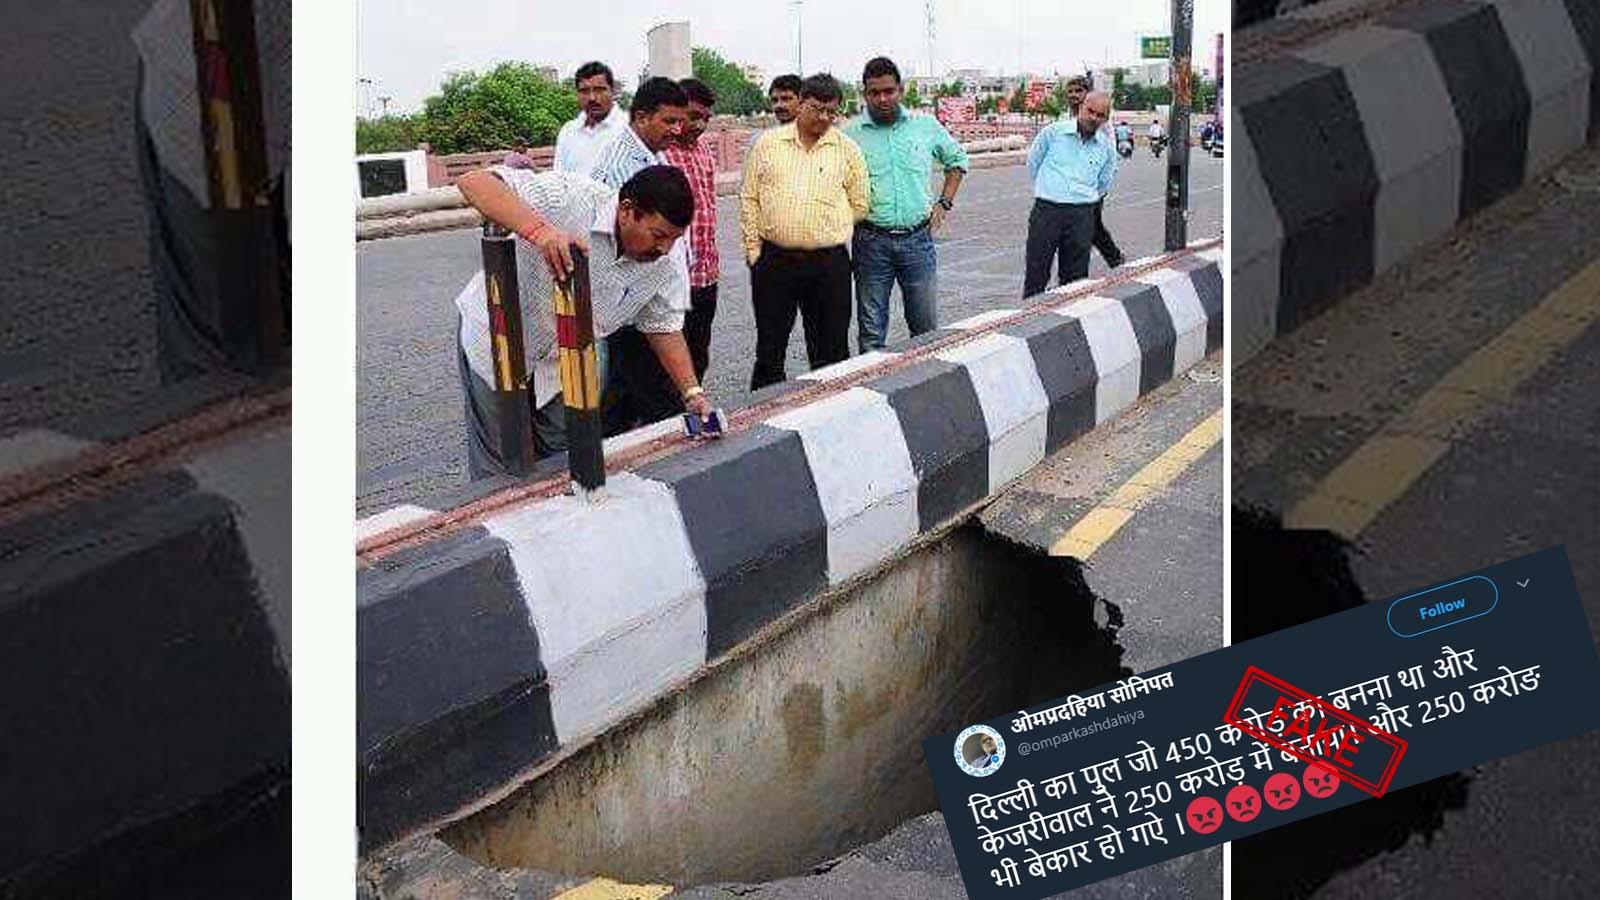 Fake News, Picture, Viral, Fact Check, Fact Checker, NewsMobile, Flyover, Delhi, New Delhi, Chief Minister, Rs 350 crore, Lucknow, Uttar Pradesh, Mobile News, India